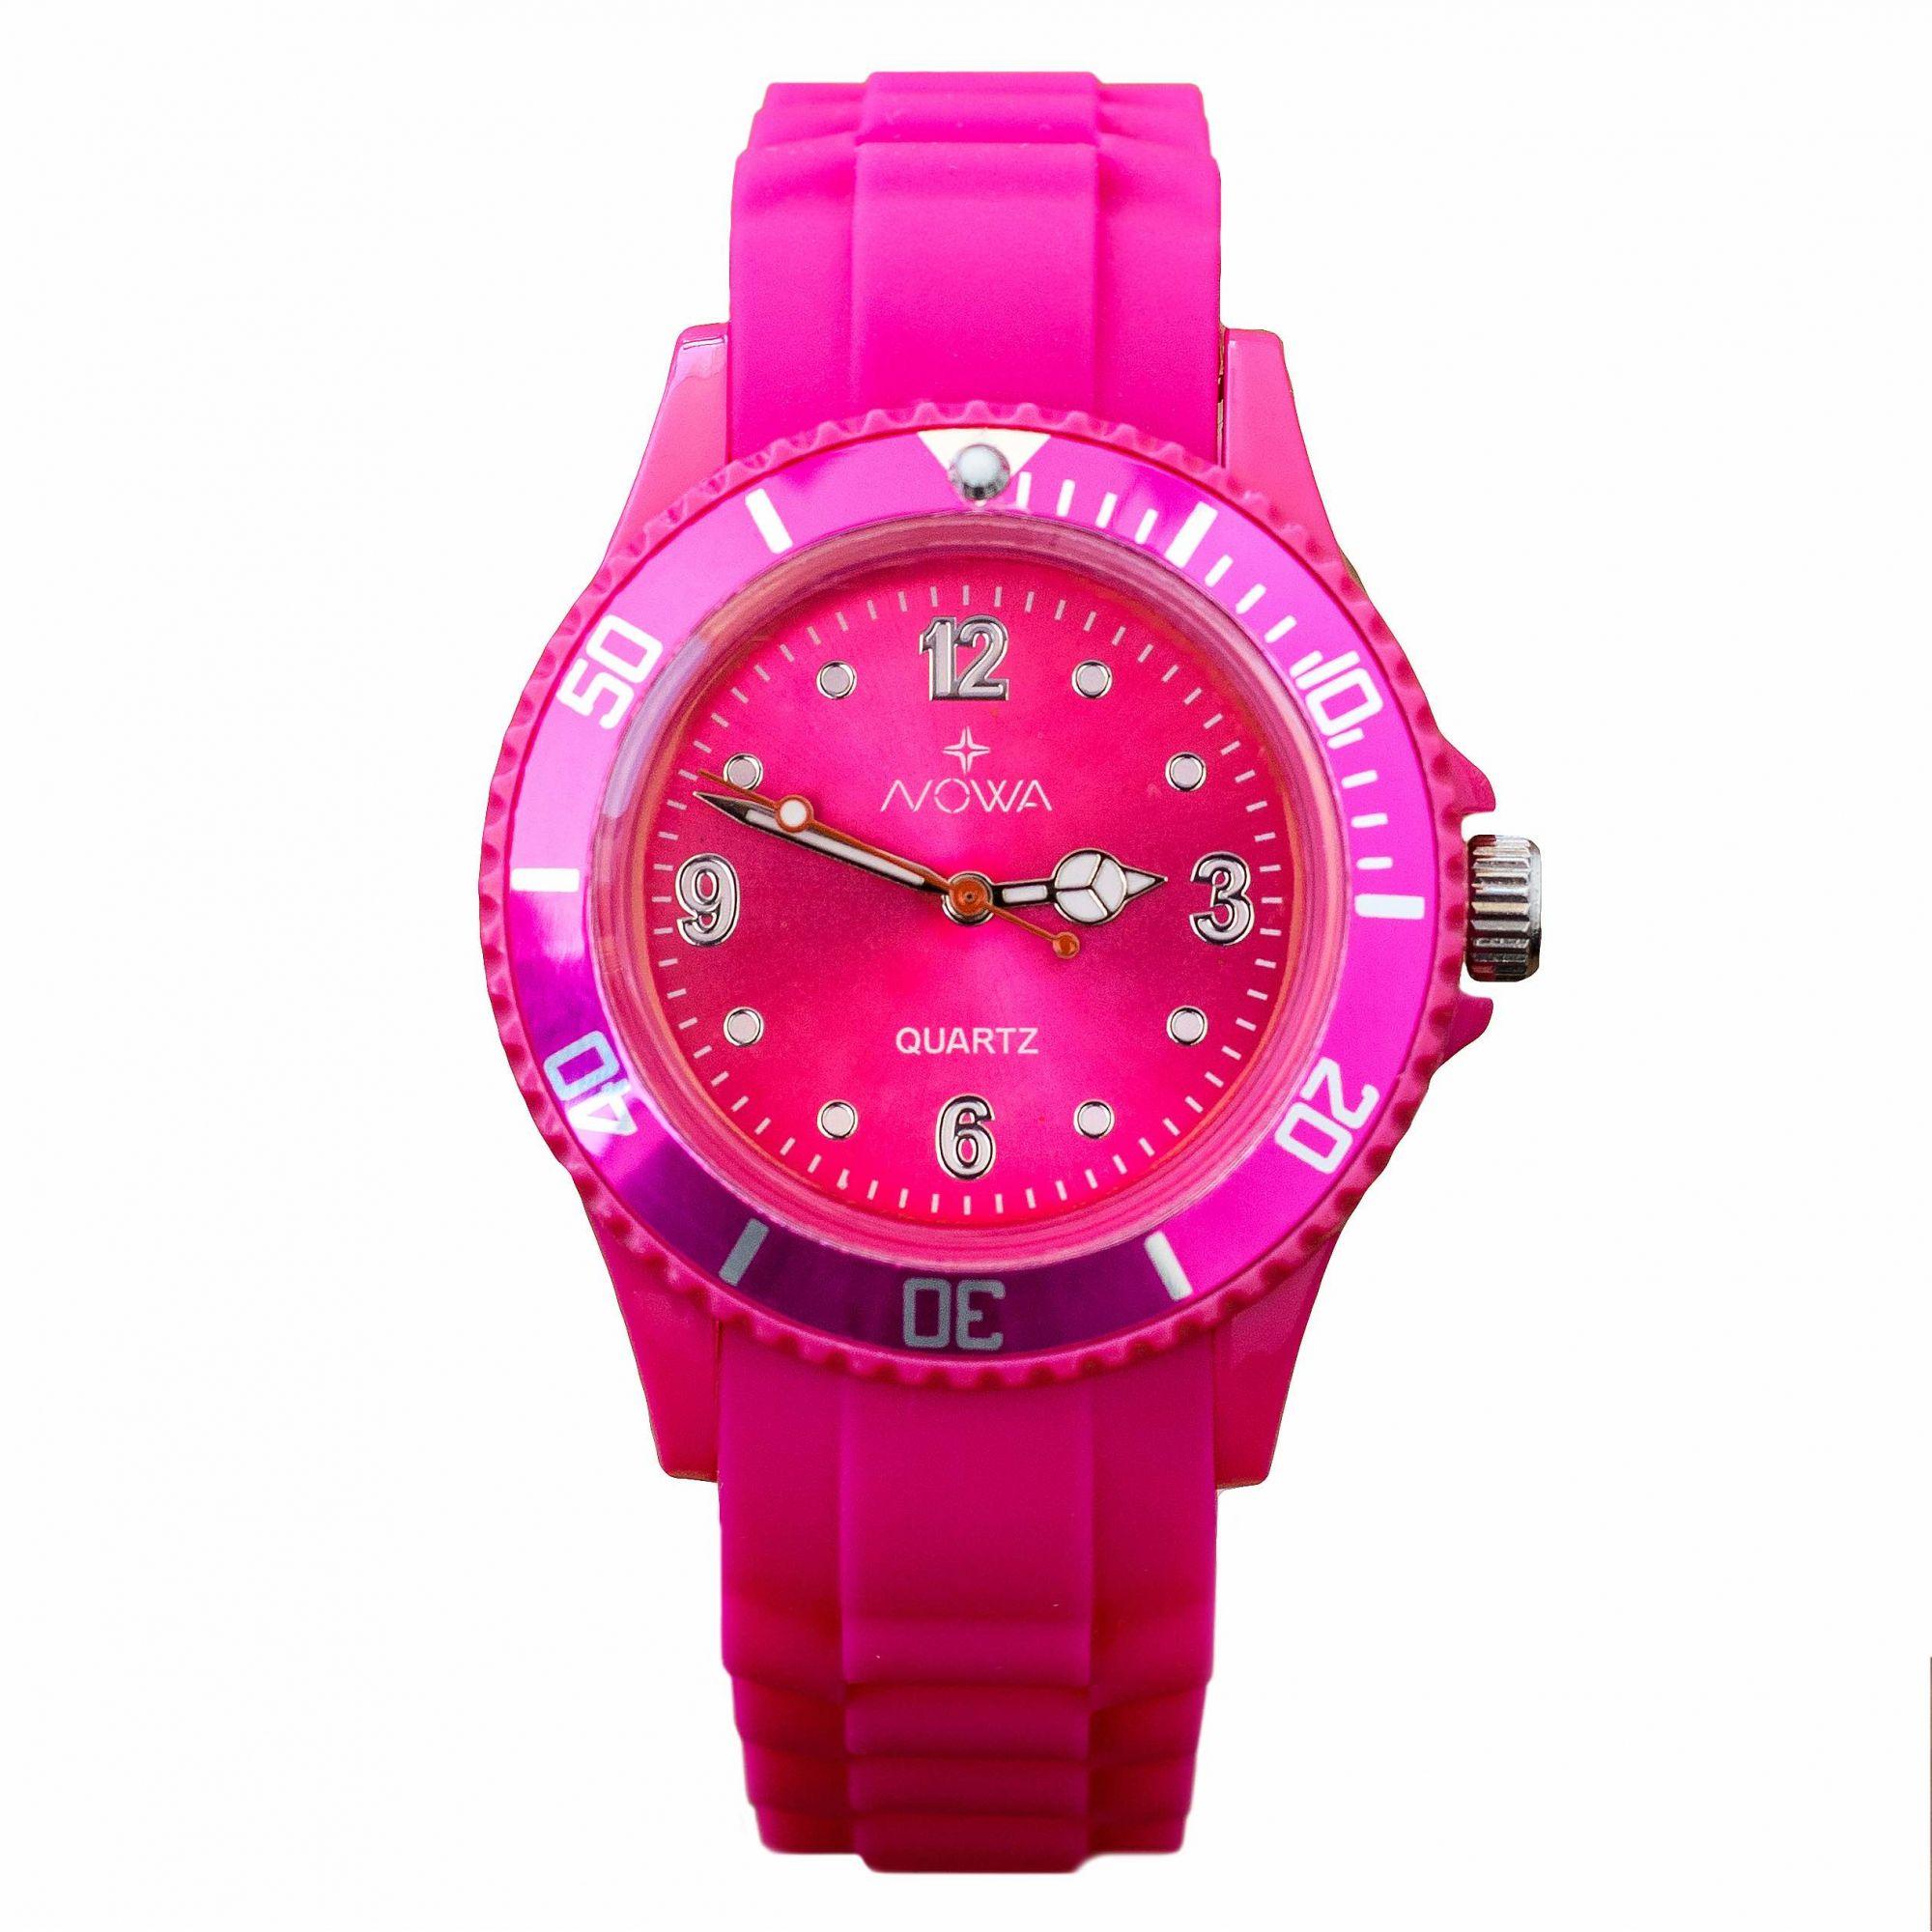 Relógio Nowa Feminino Rosa NW0523RK Borracha